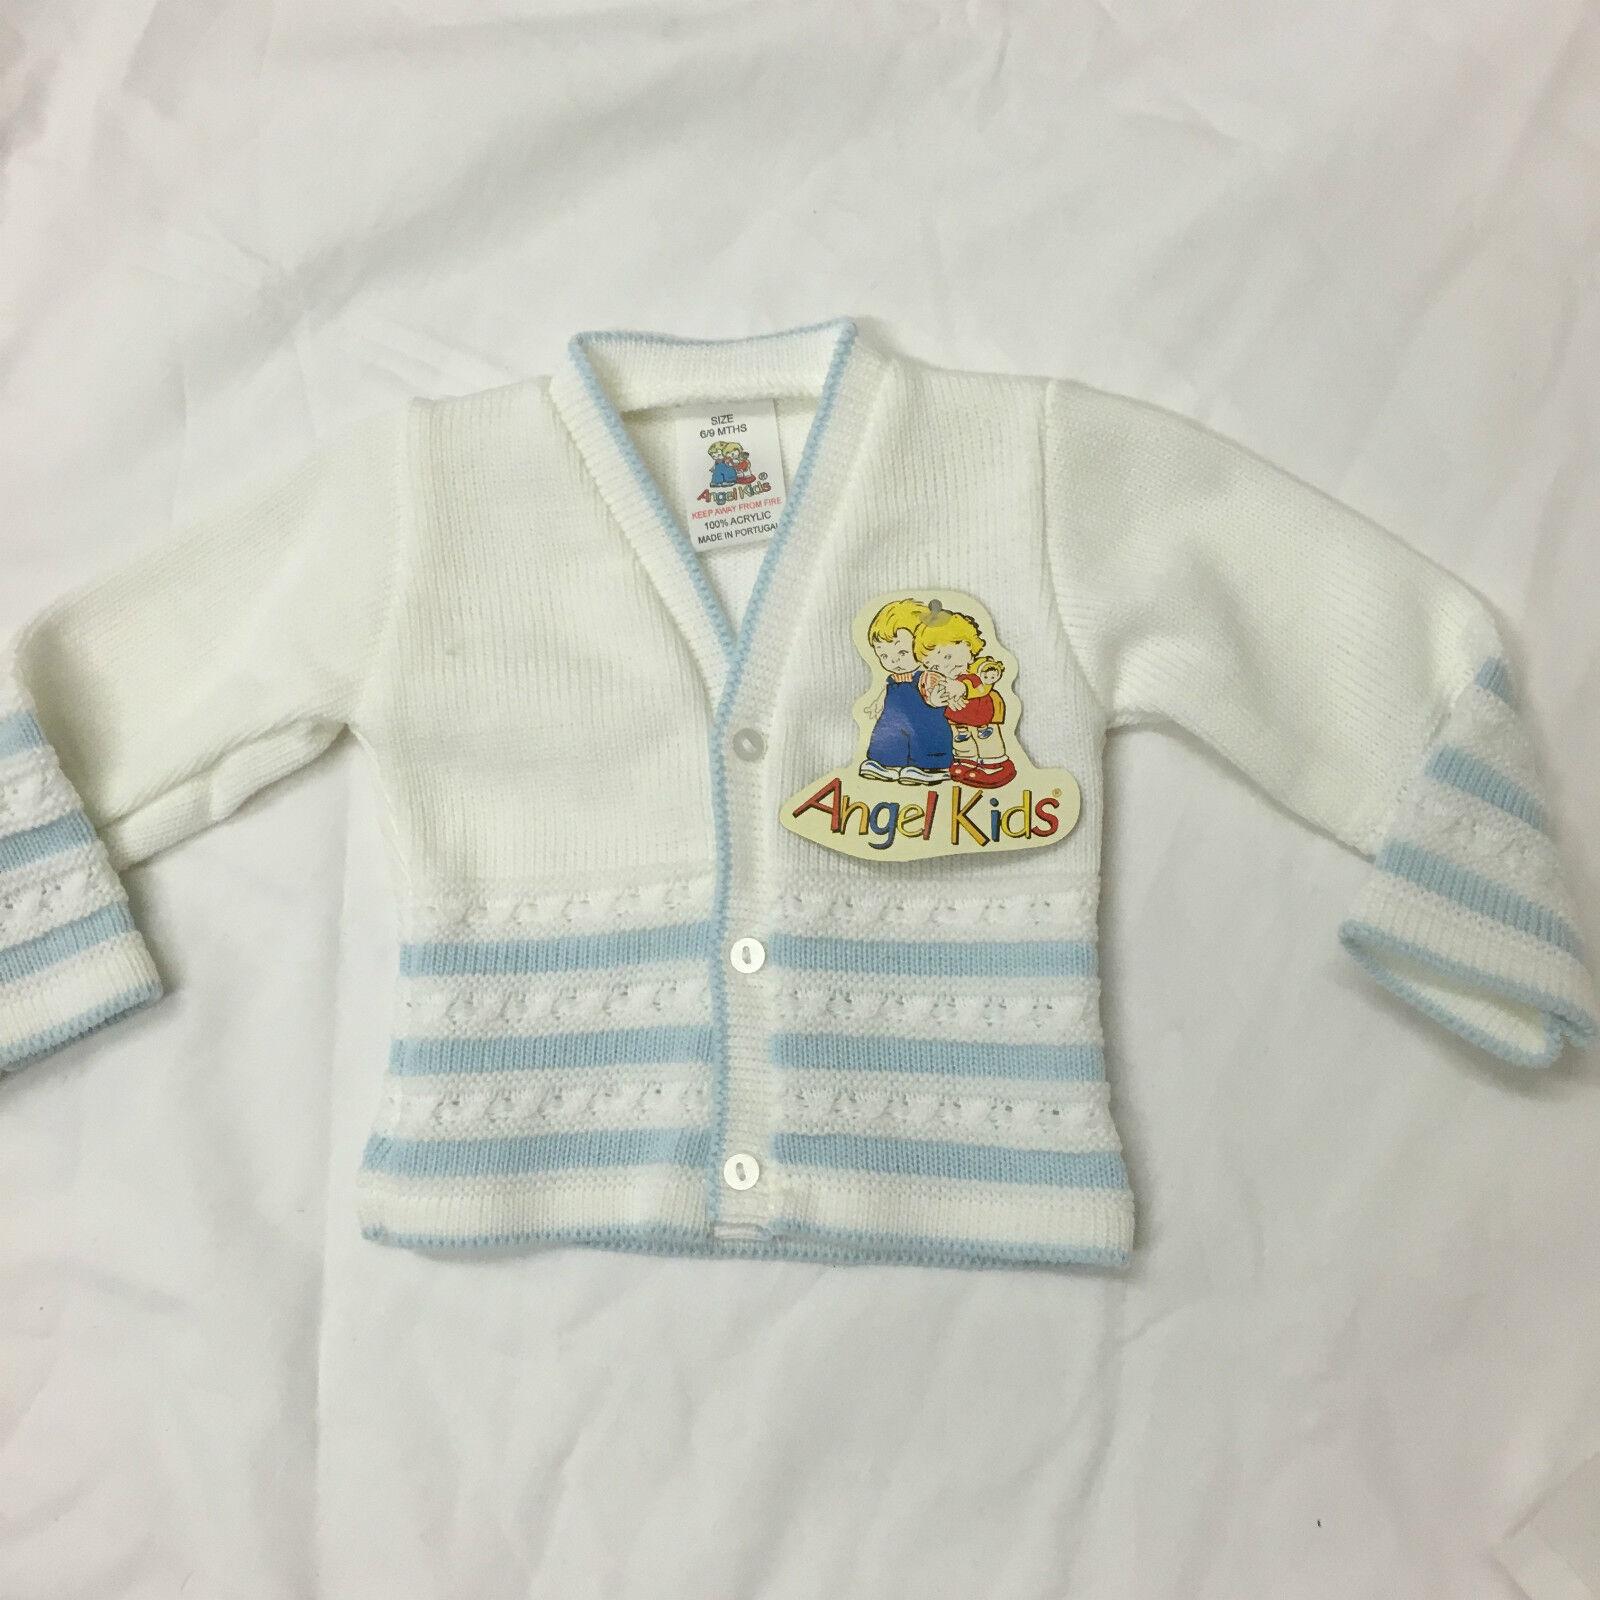 Baby babies boy boys cardi cardis cardigan cardigans blue white clothing